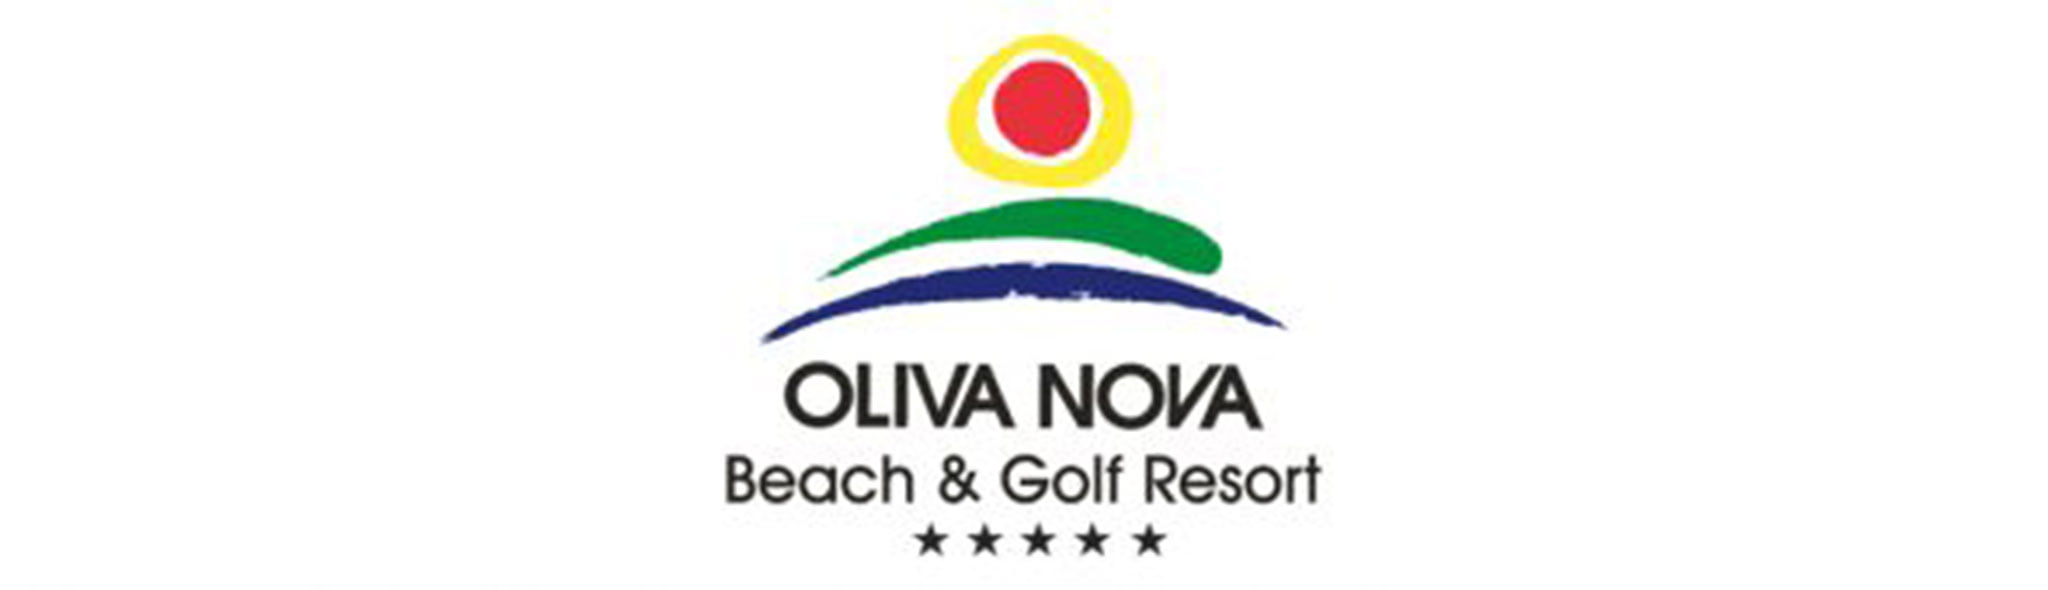 Logotipo de Oliva Nova